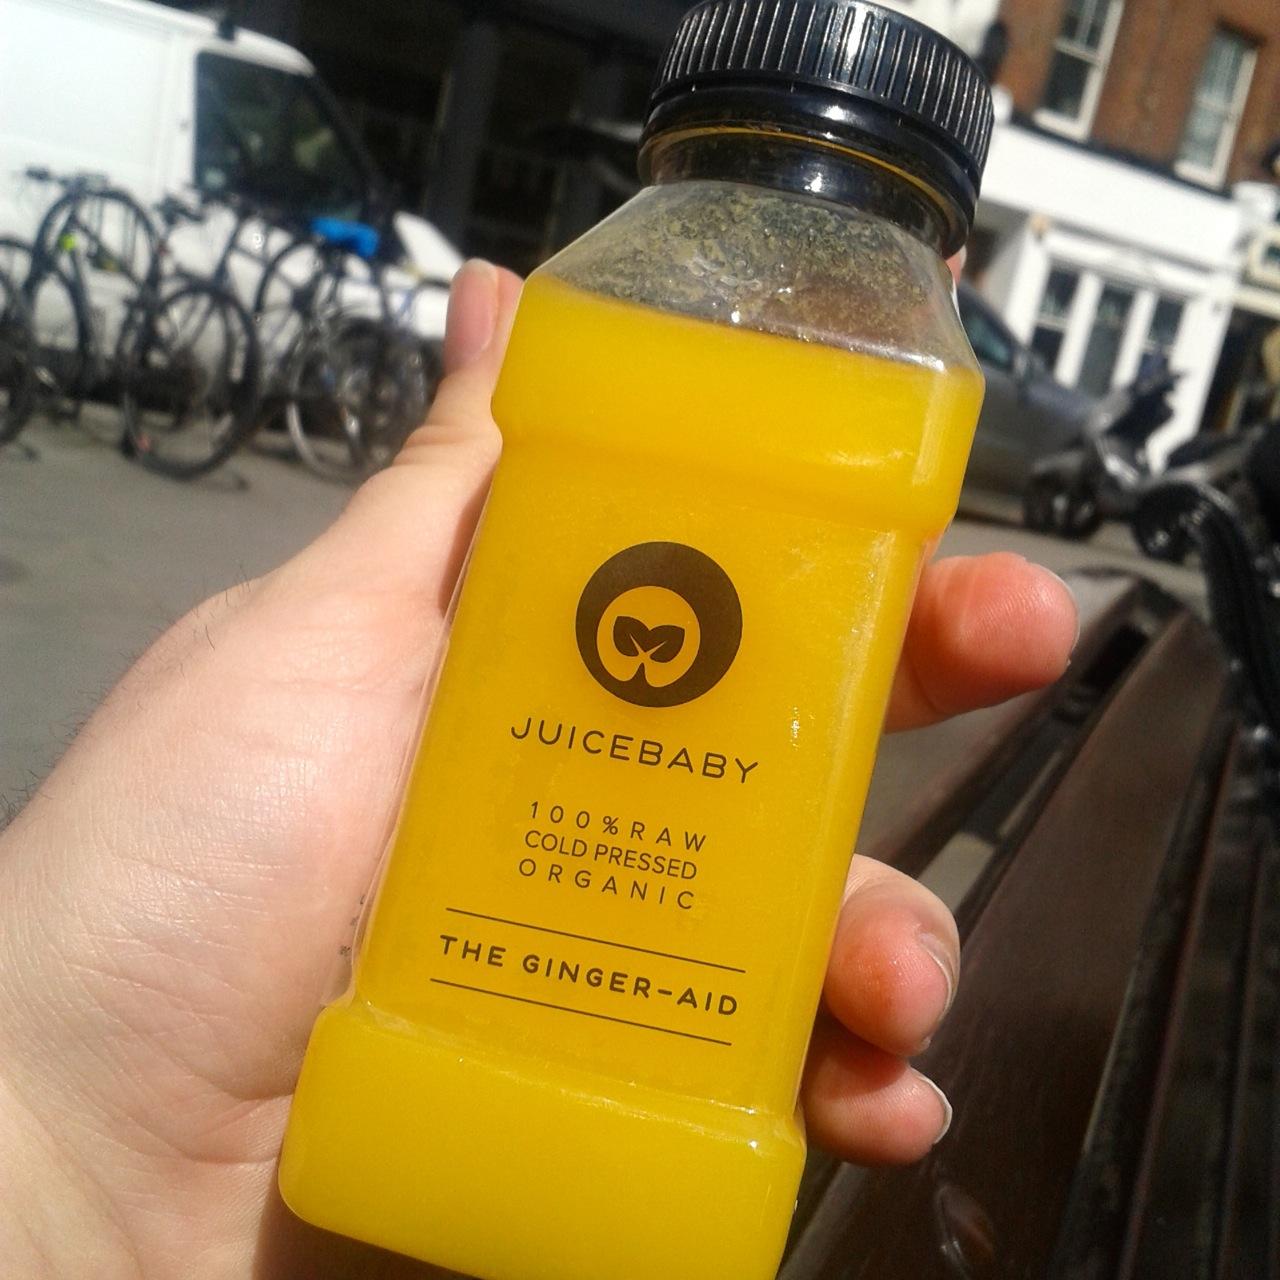 https://i2.wp.com/fatgayvegan.com/wp-content/uploads/2015/04/the-ginger-aid-Juice-Baby.jpg?fit=1280%2C1280&ssl=1